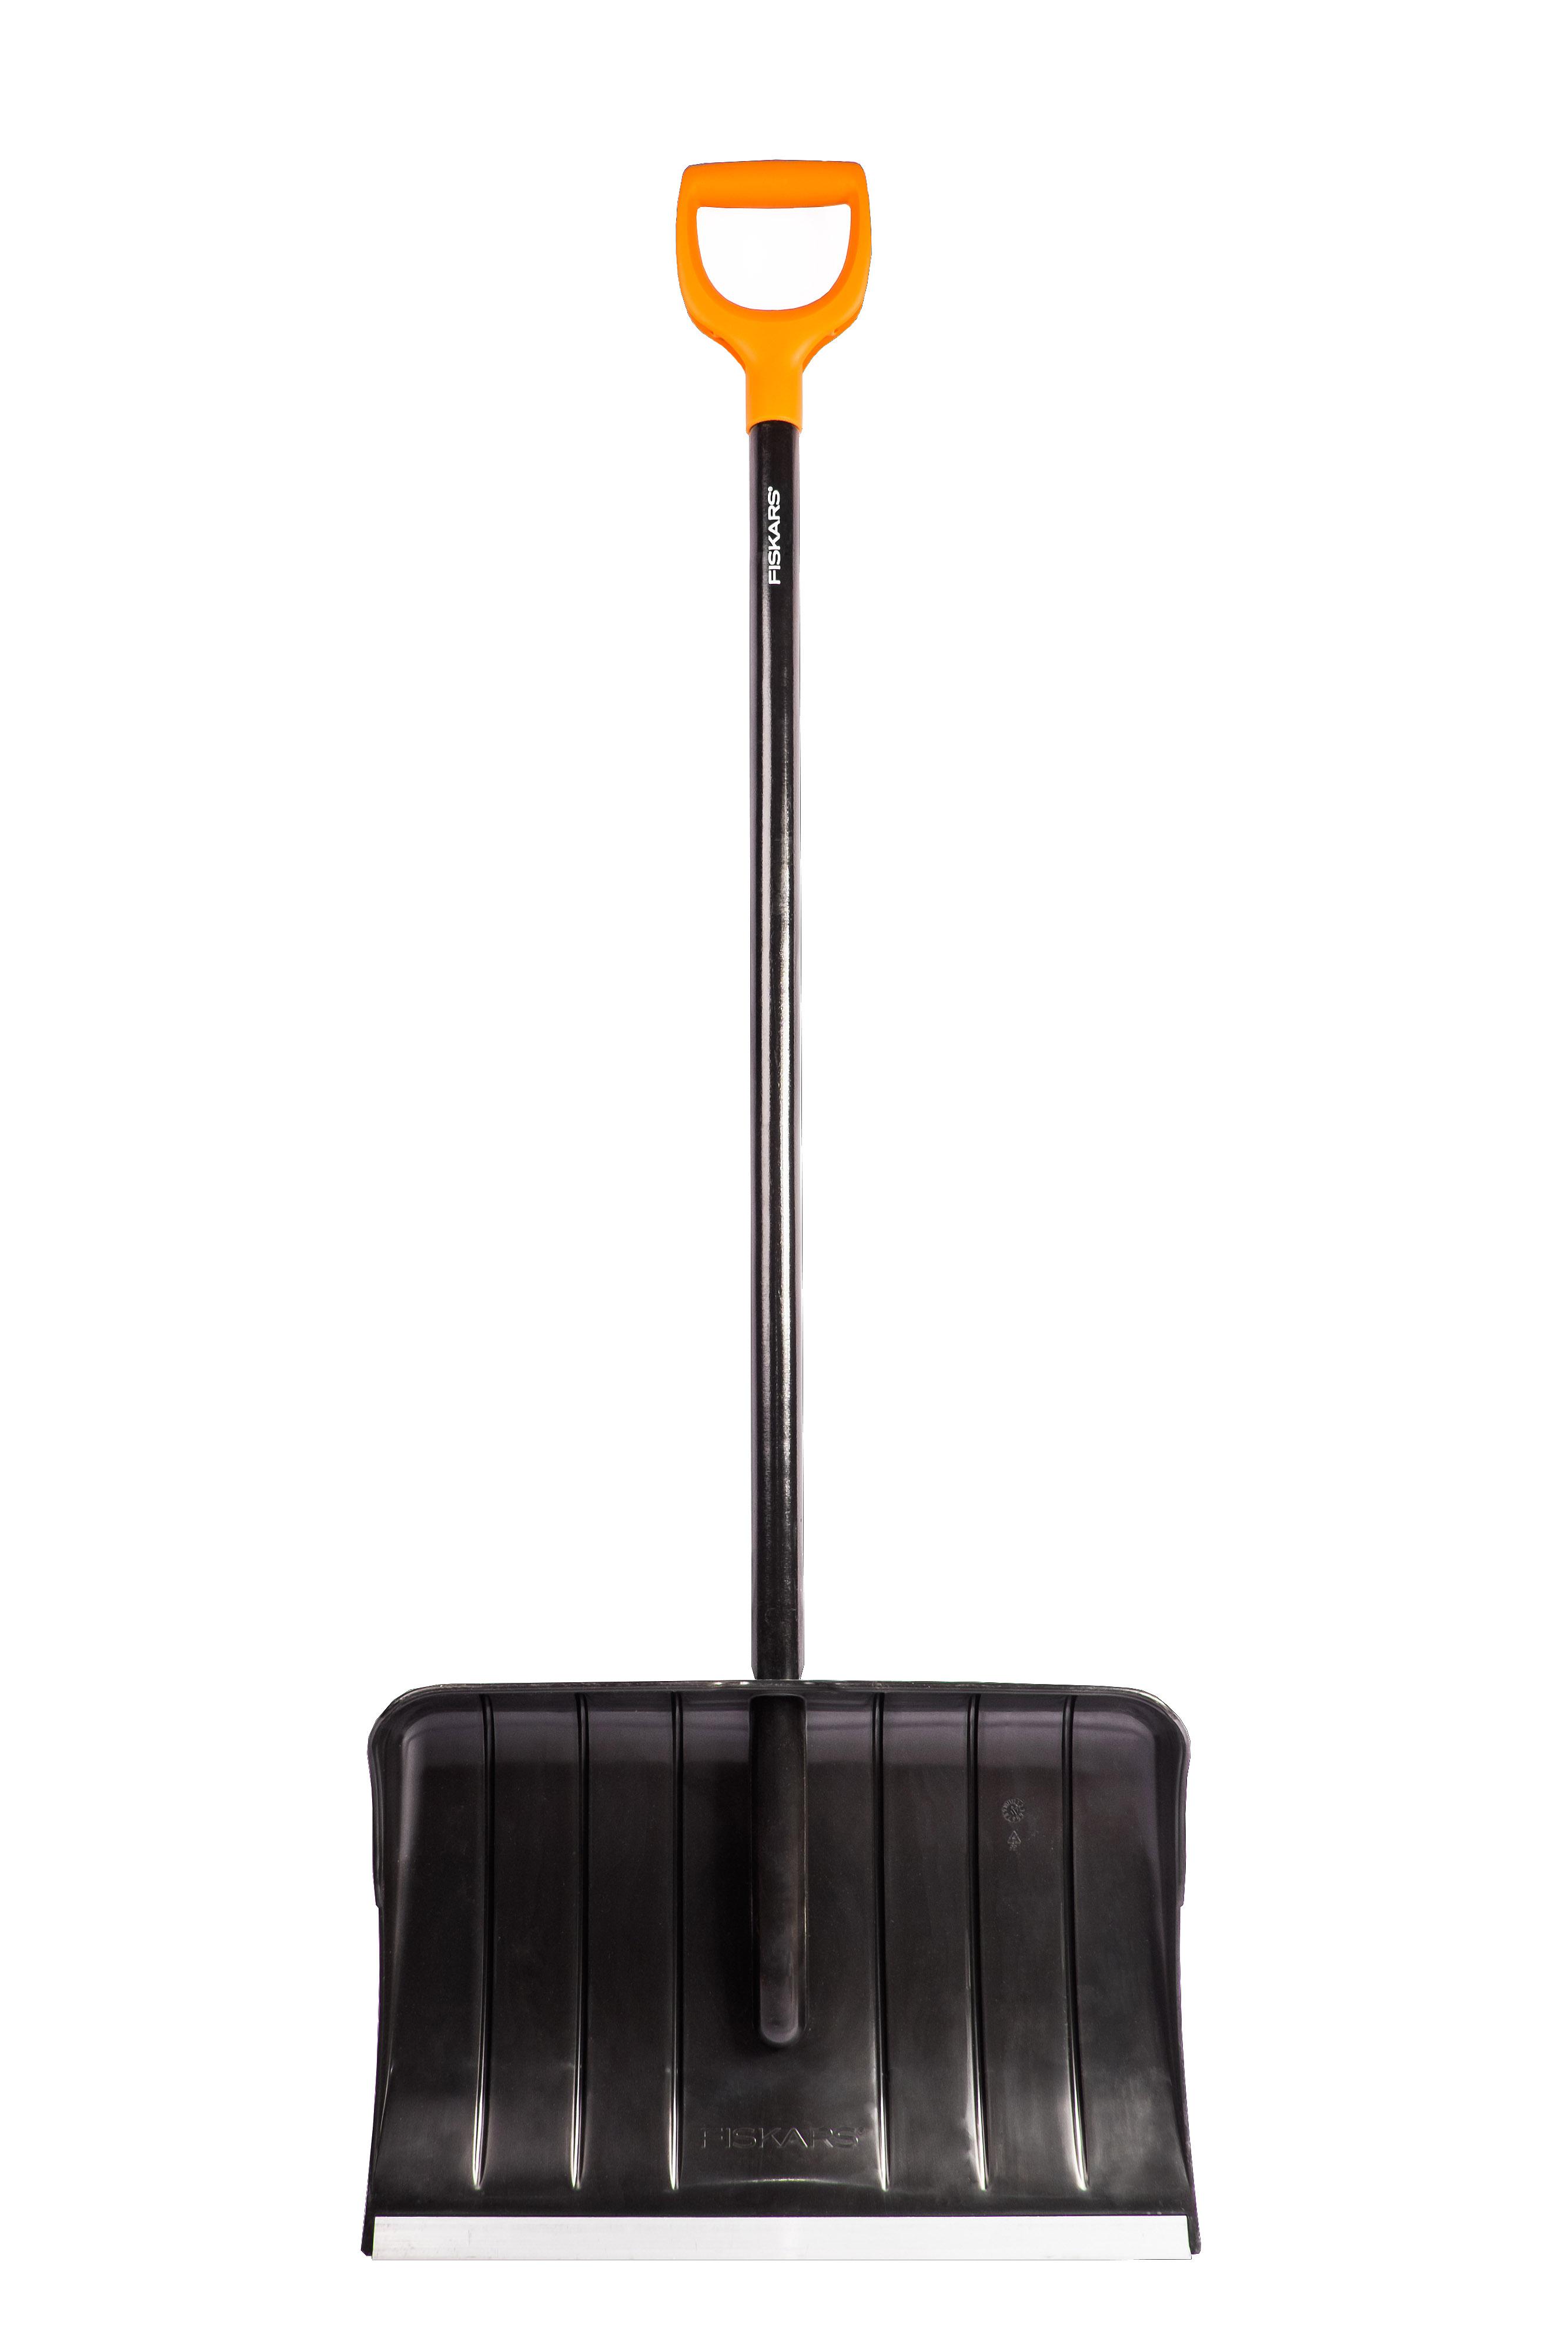 Скрепер Fiskars Solid, для уборки снега скрепер для уборки снега fiskars snowxpert 143001